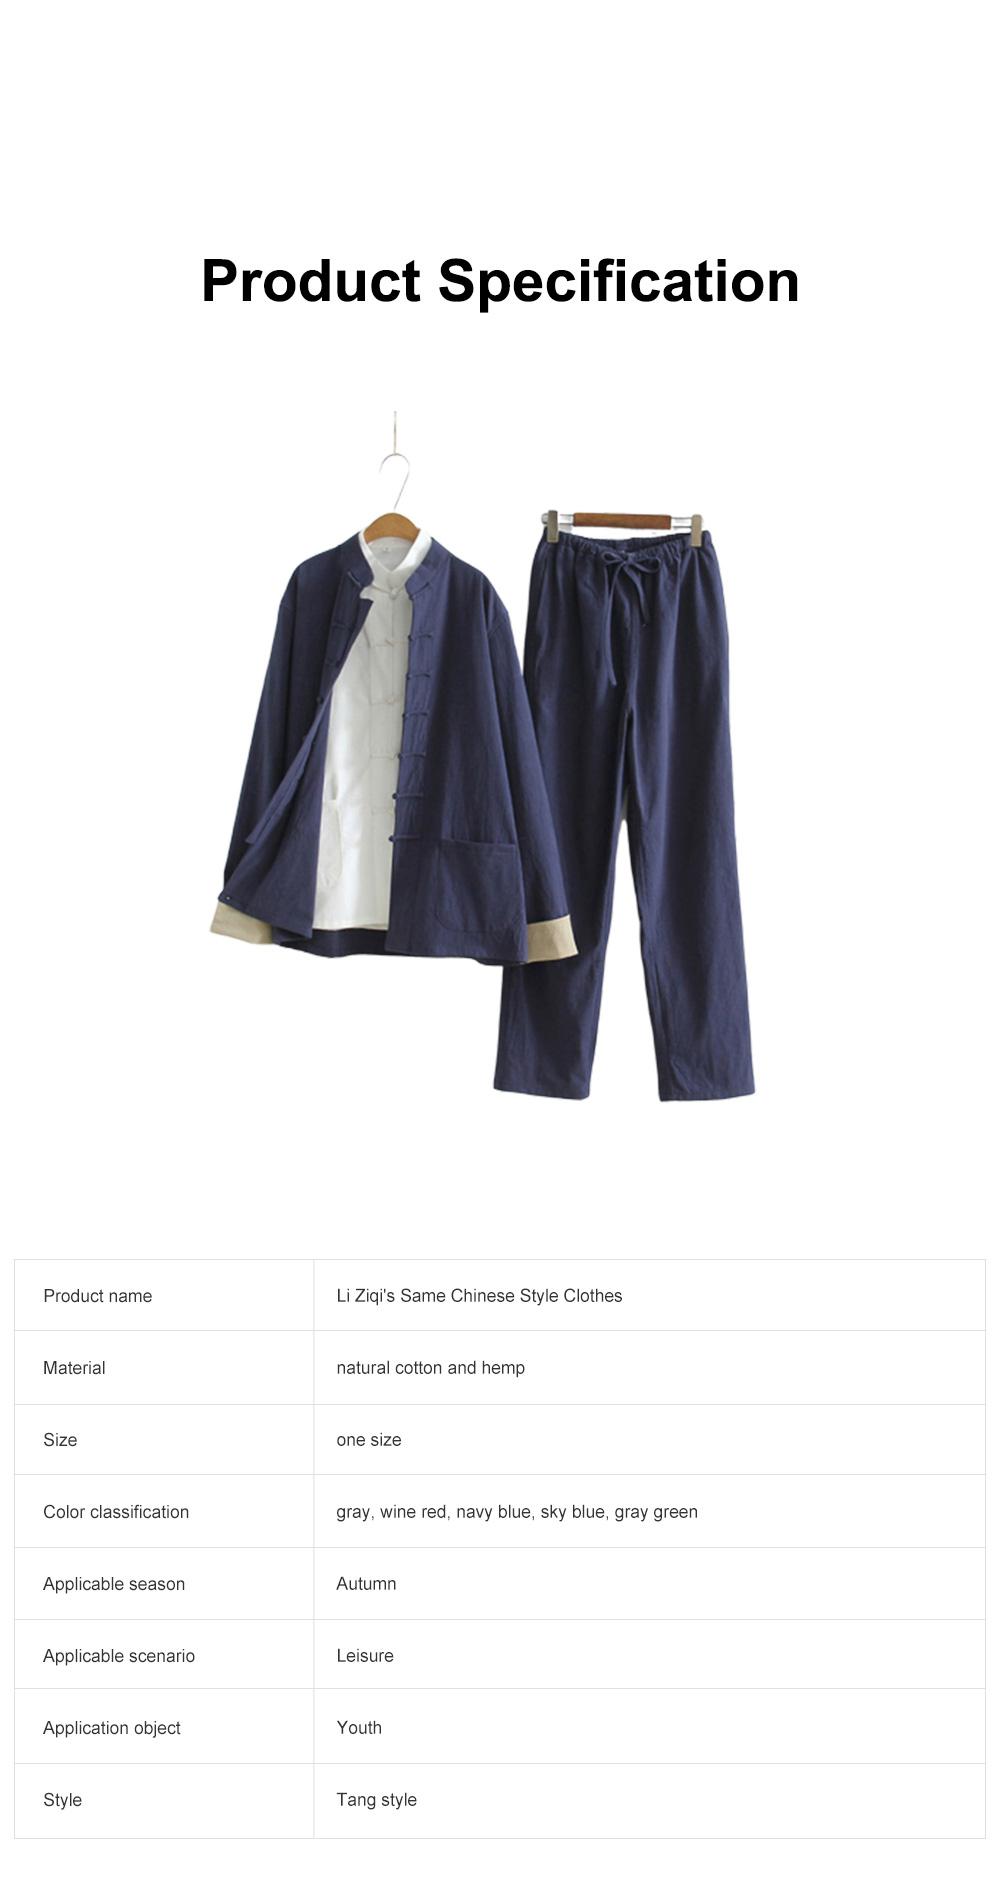 Li Ziqi's Chinese Style Clothes Retro Han Suit Chinese Ancient Style Cotton Hemp Three Piece Suit Reclusive Clothes Meditation Clothes 8